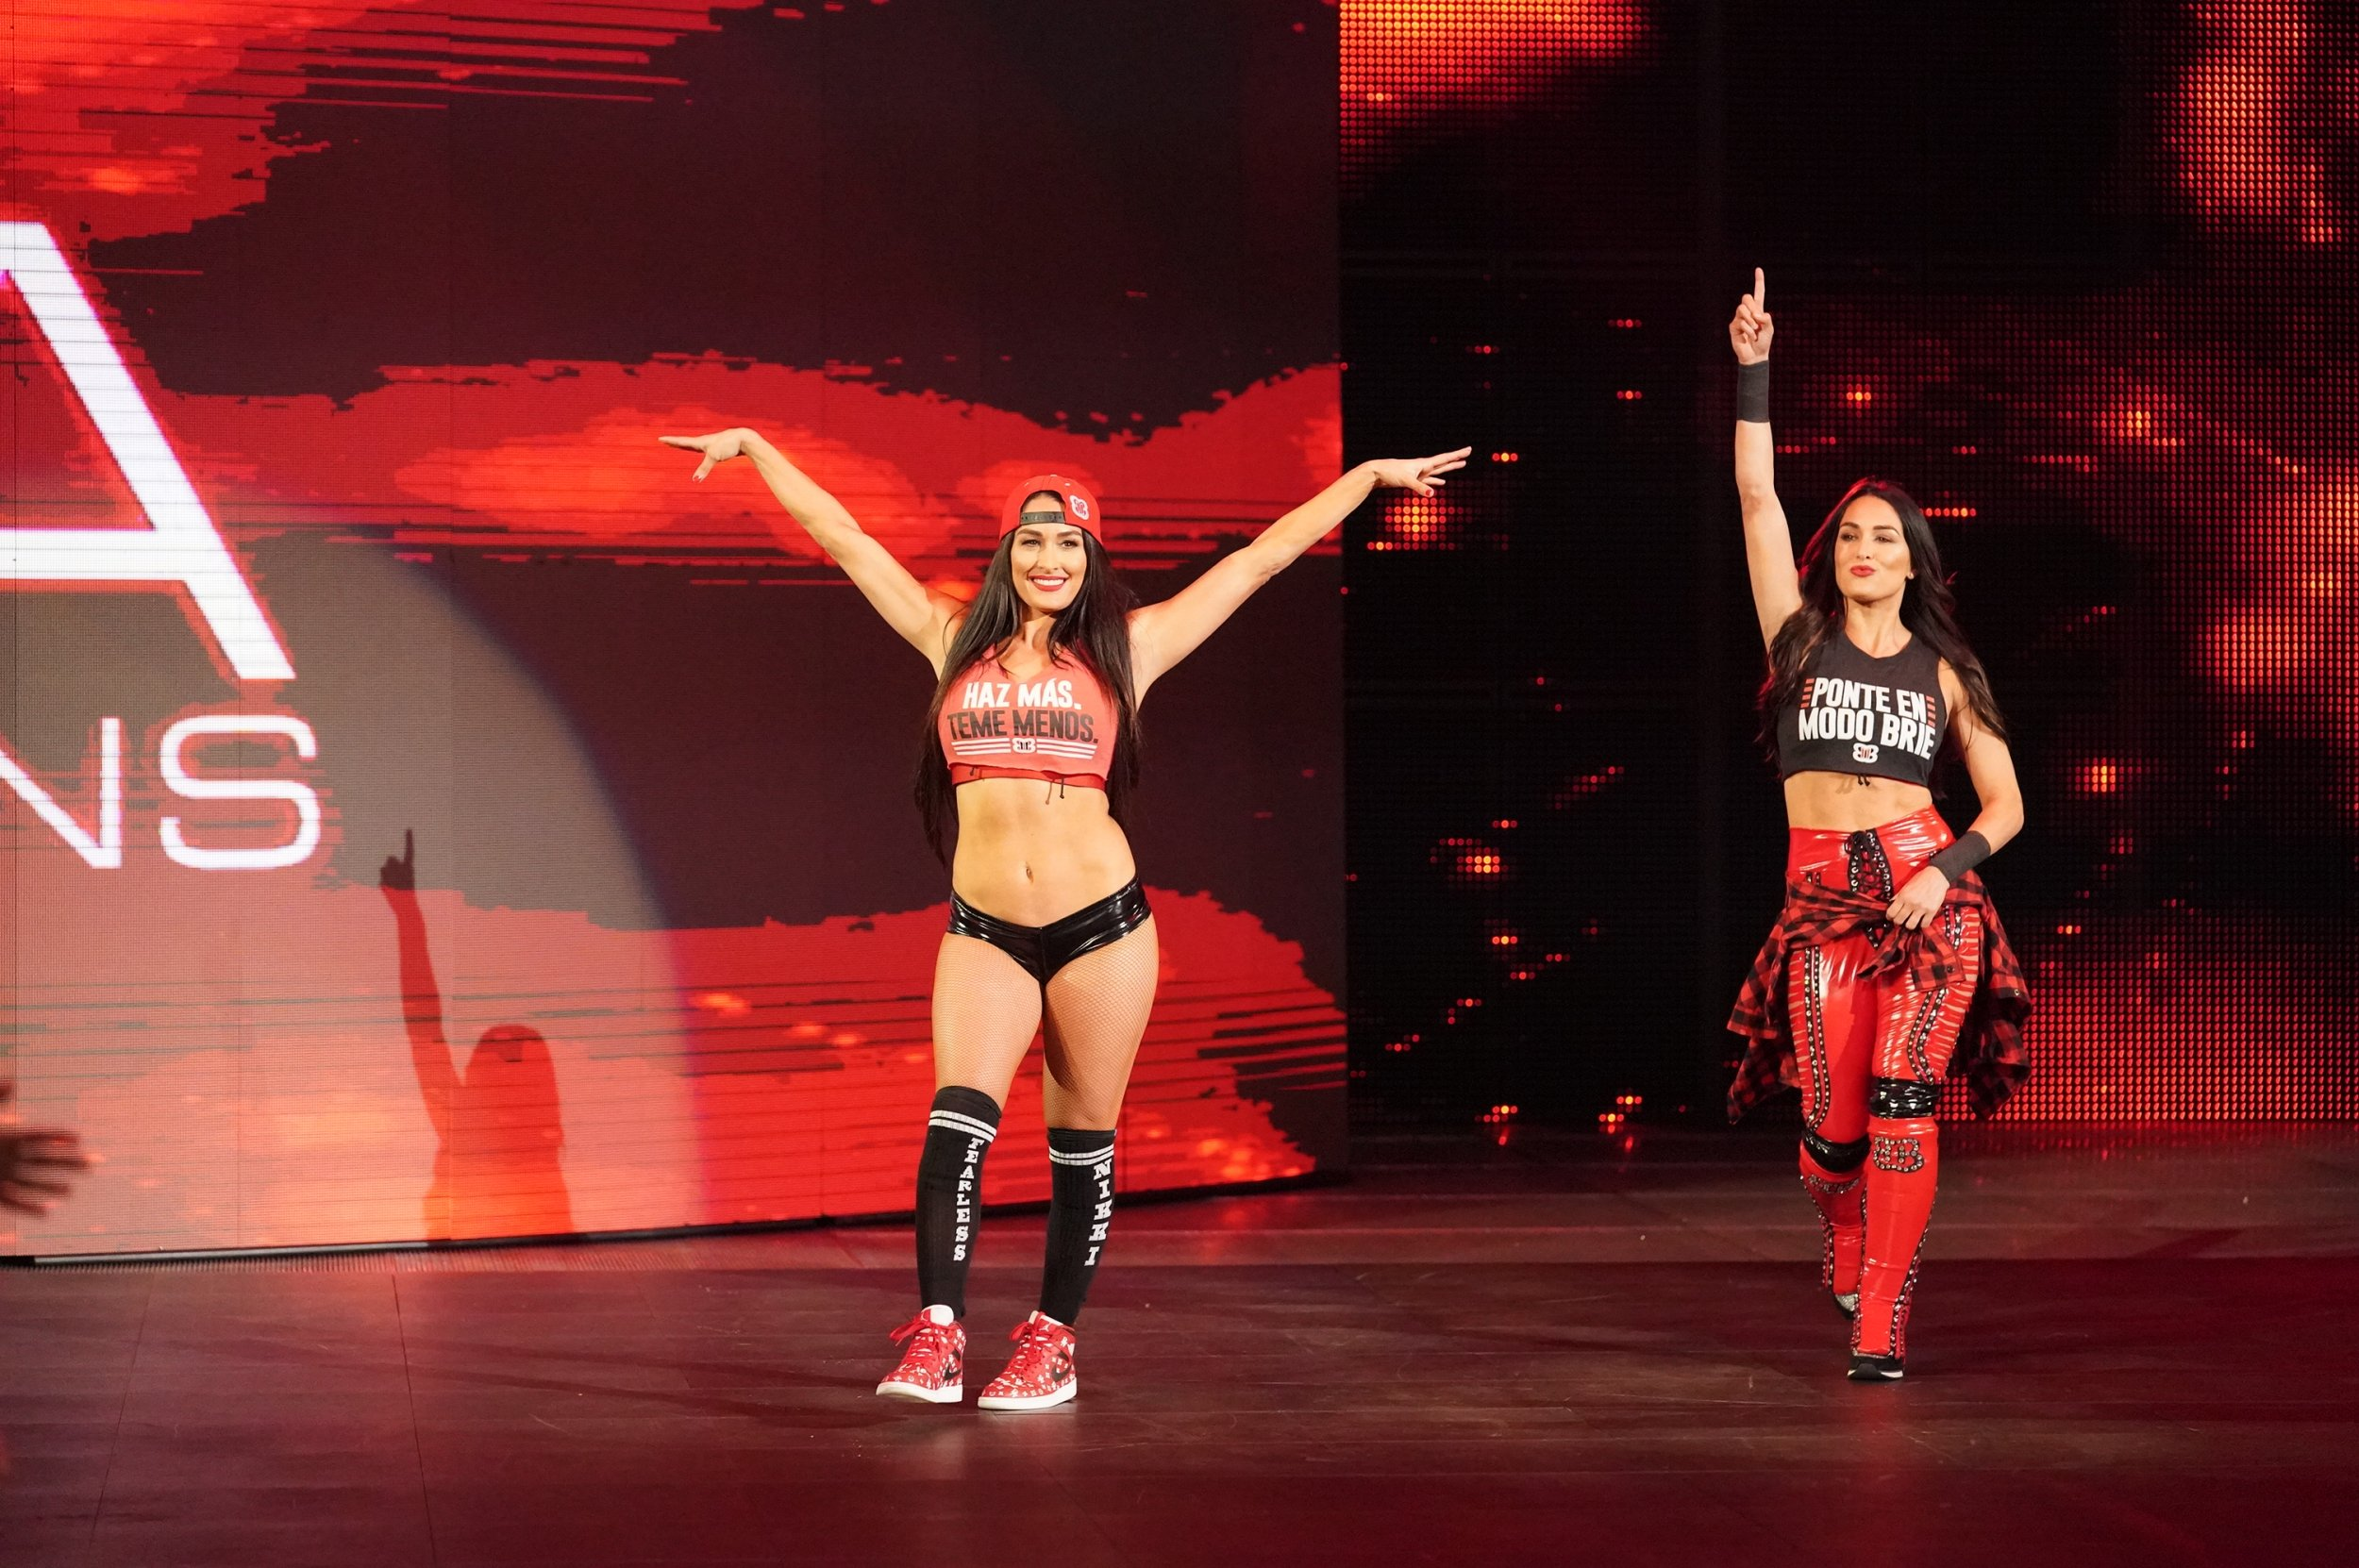 Nikki brie bella wwe raw